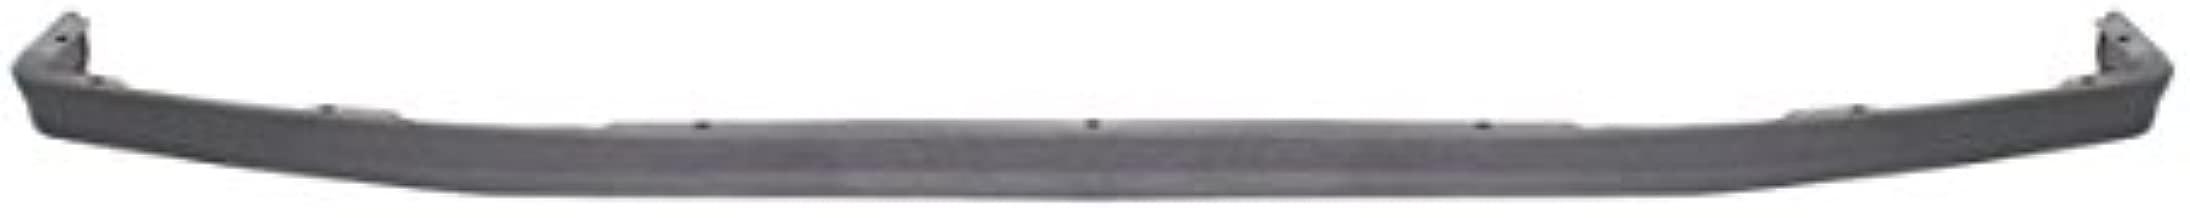 Koolzap For 87-91 F-Series Truck Front Spoiler Valance Air Dam Deflector Apron Garnish Panel